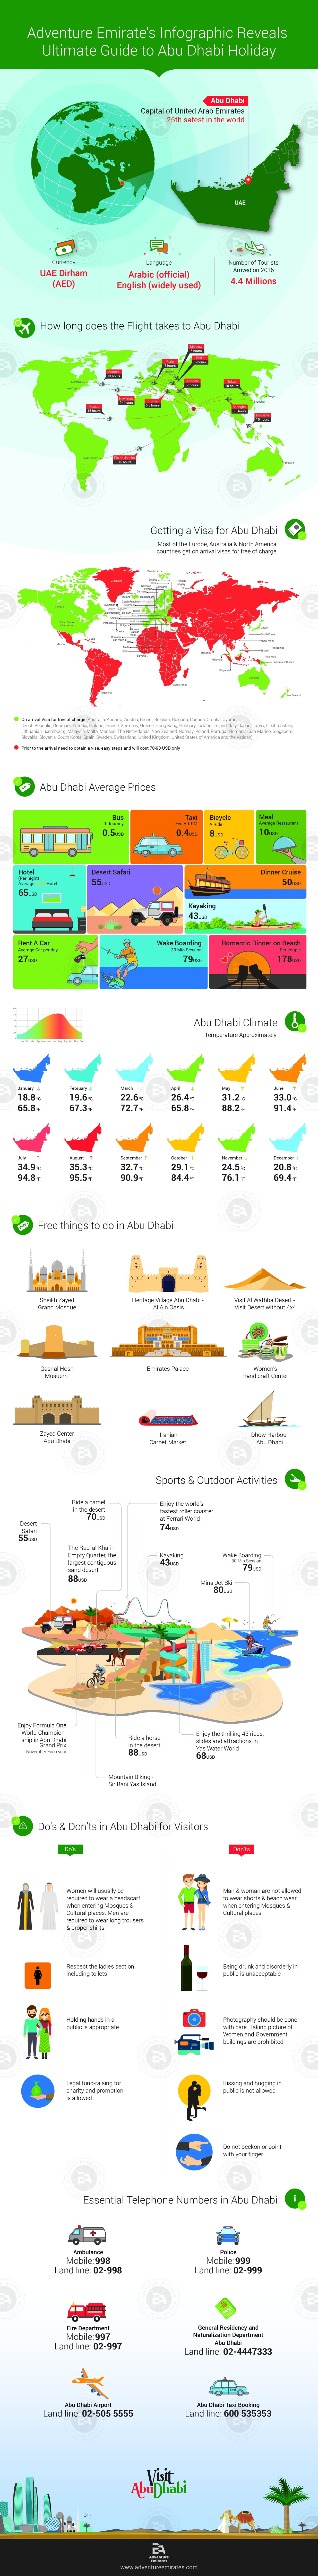 Adventure Emirate's Infographic